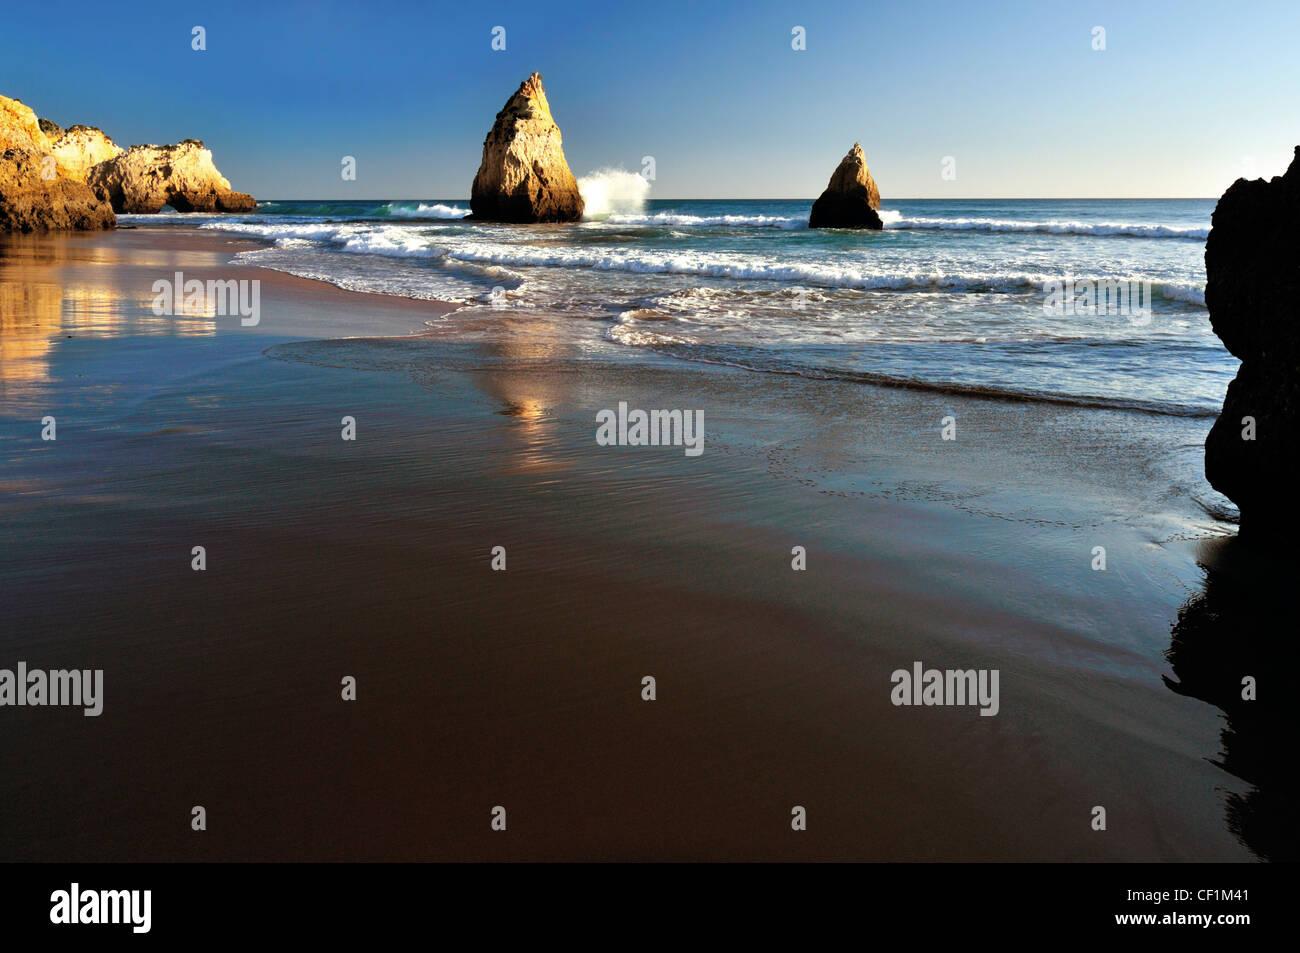 Portugal, Algarve: Rock formations at beach Prainha near Alvor - Stock Image